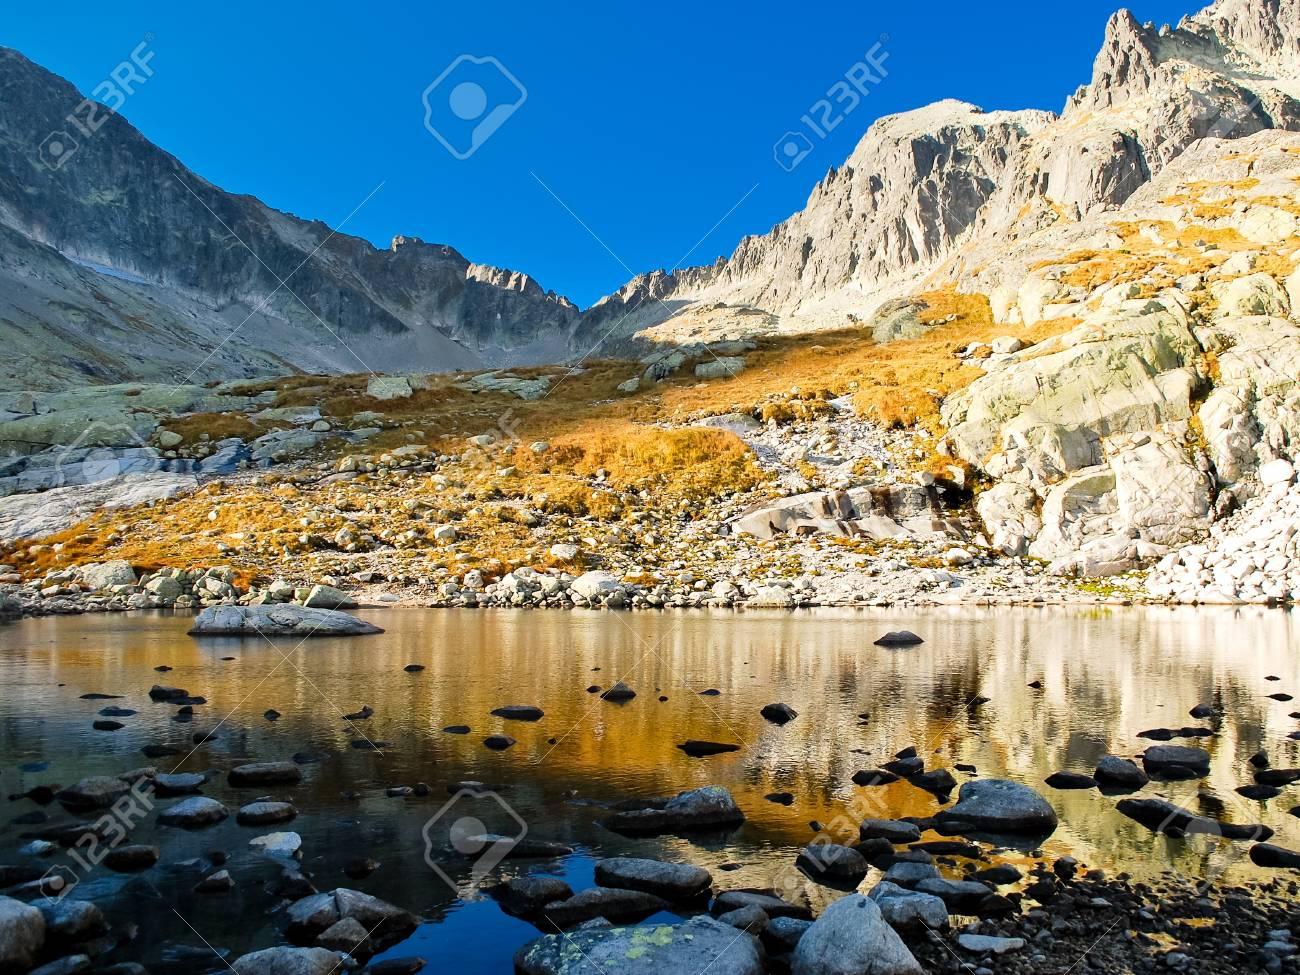 View of lake and mountains in the autumn season Stock Photo - 12348755